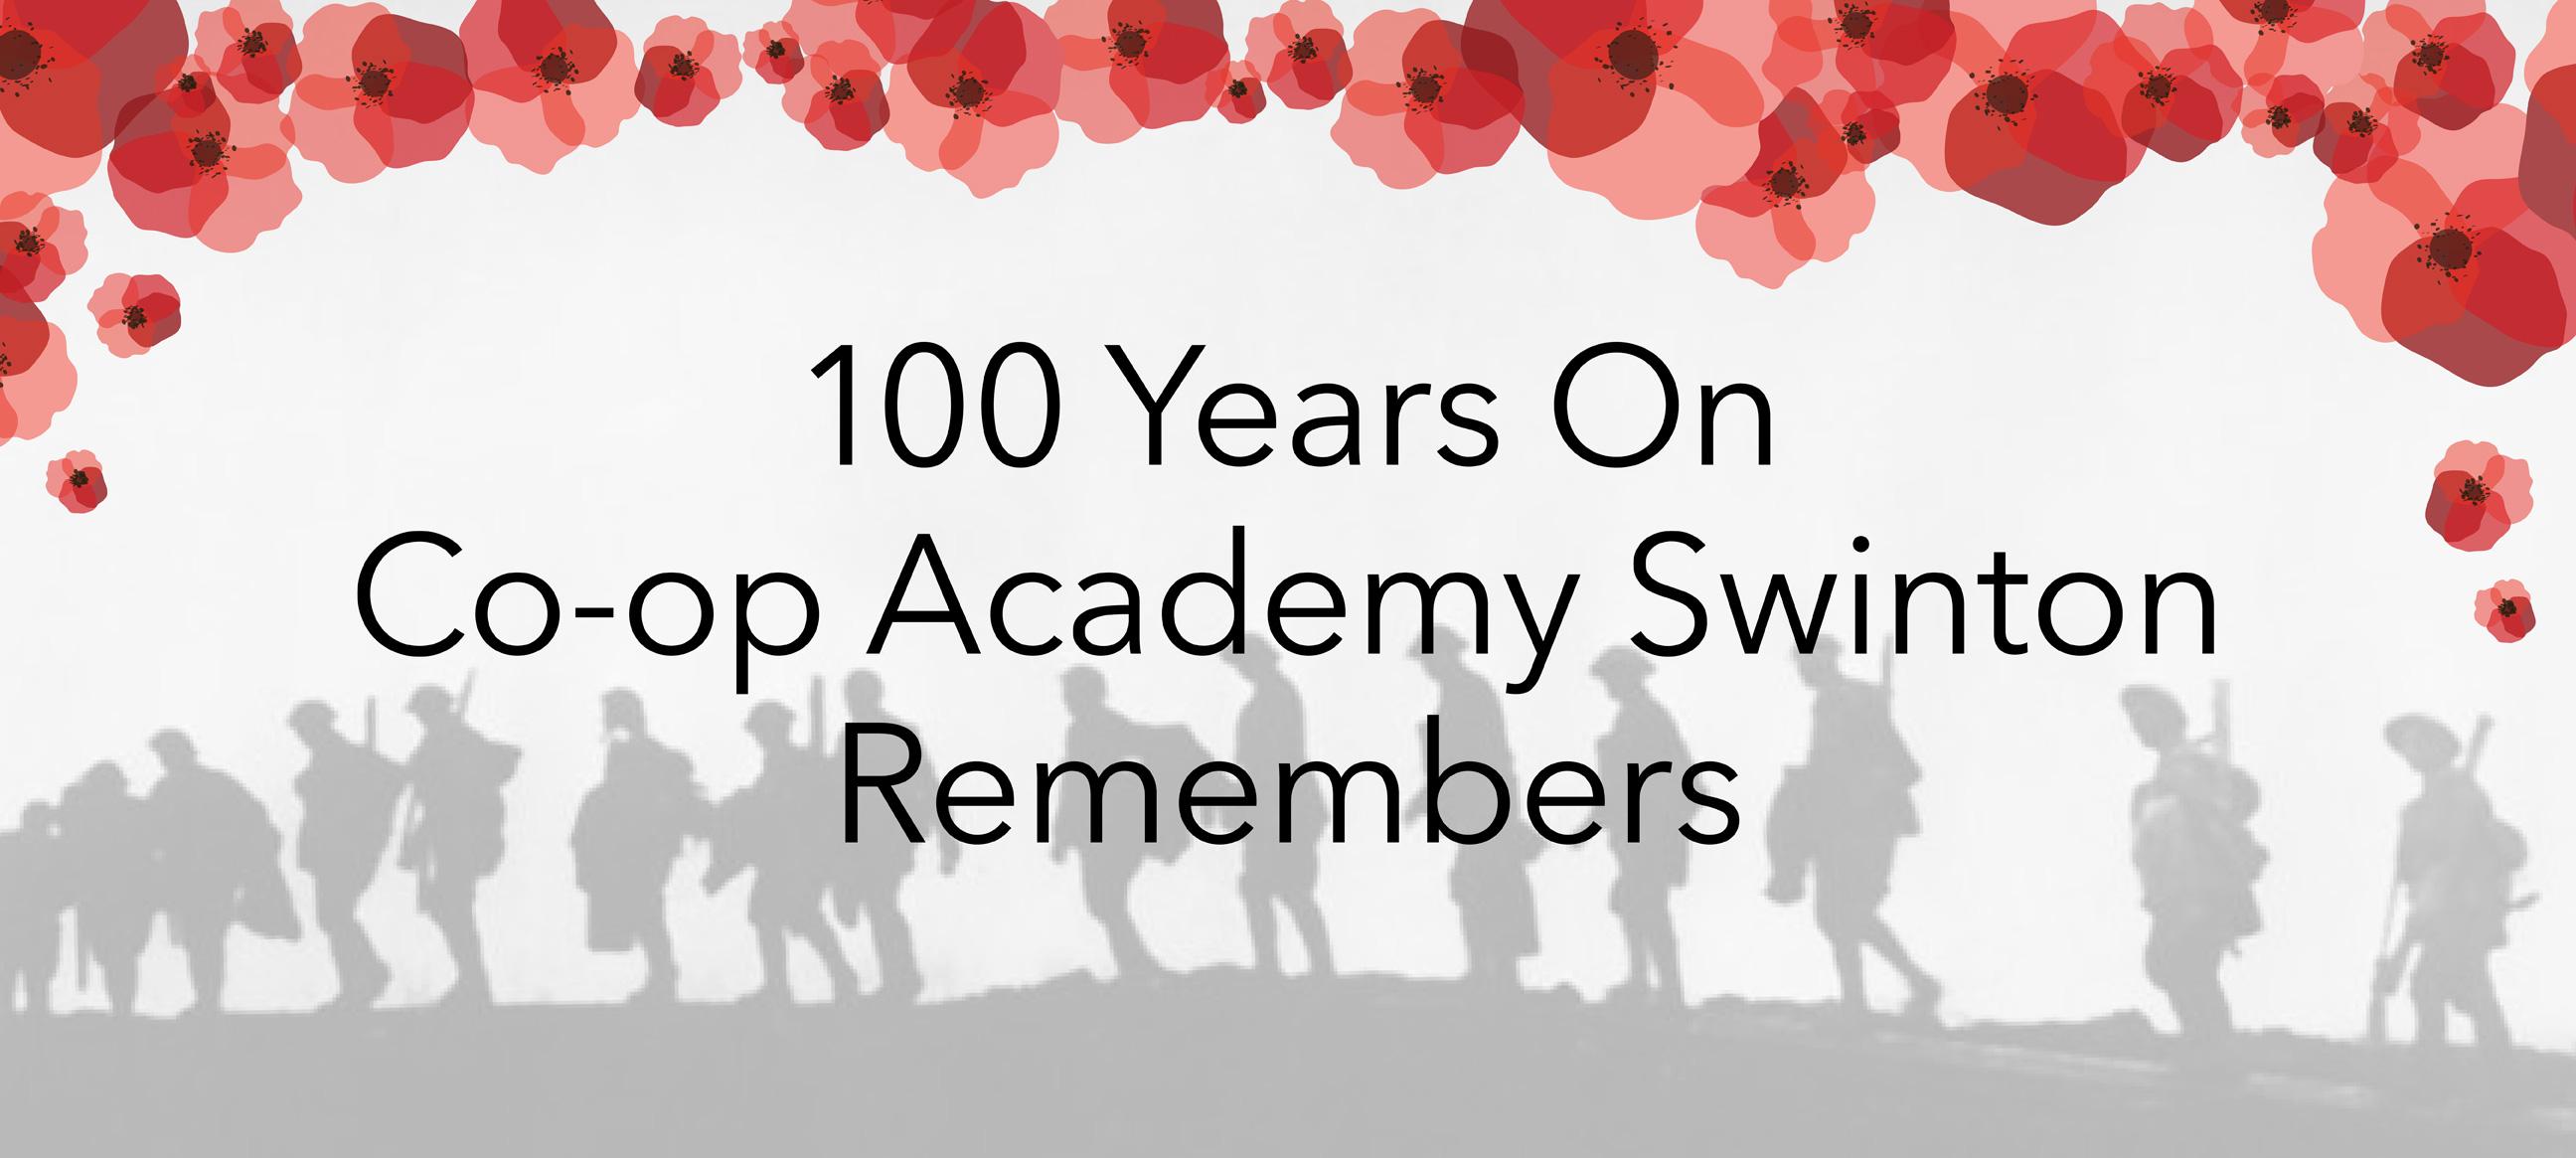 100 Years on, Co-op Academy Swinton Remembers